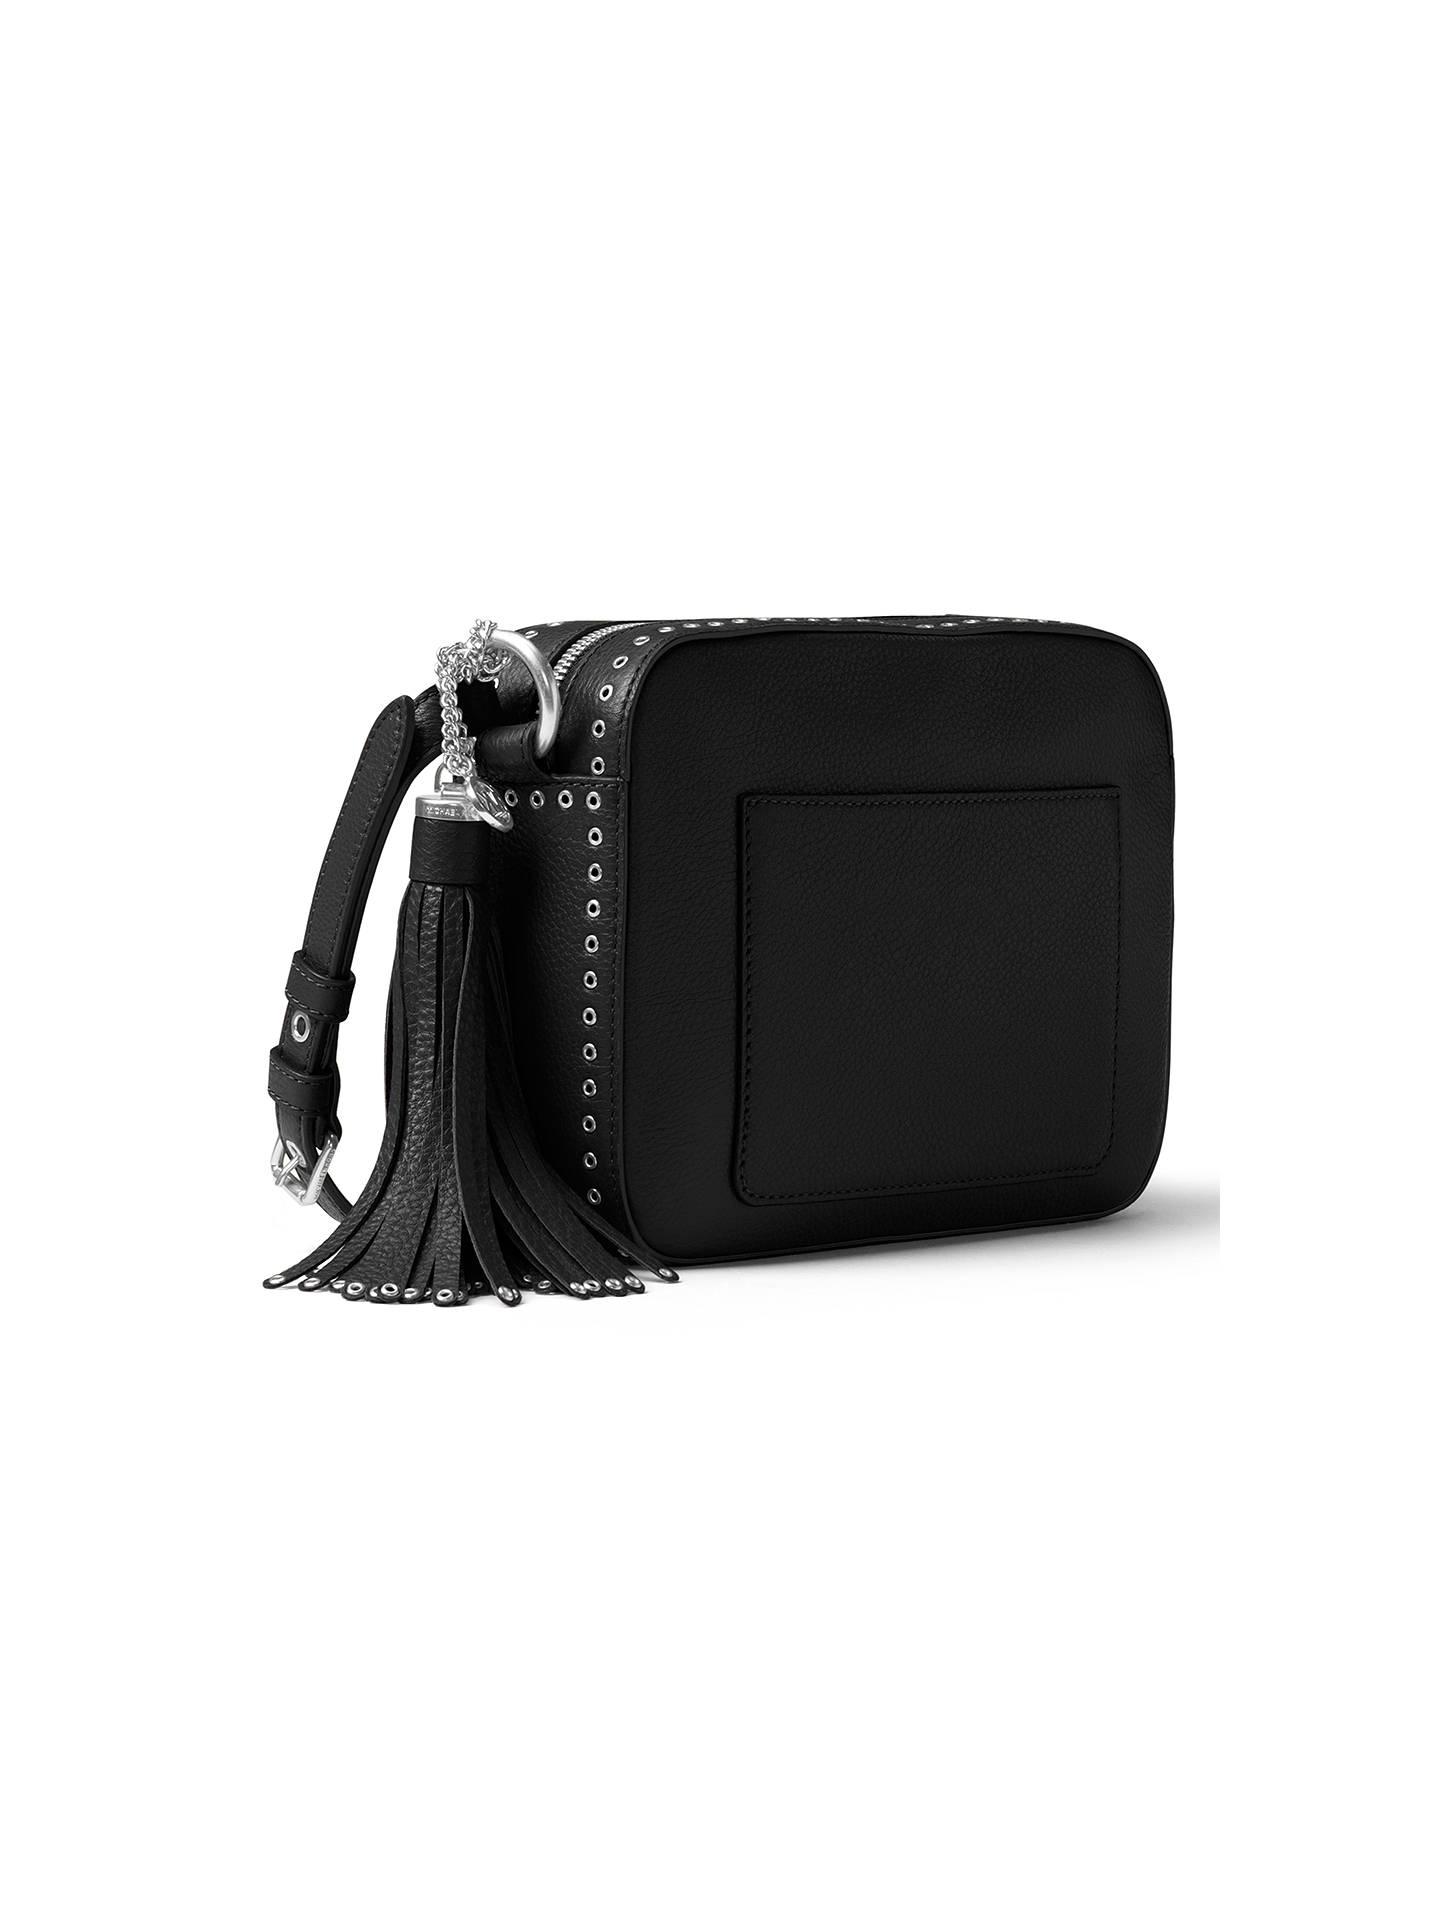 89a86b21d885 ... Buy MICHAEL Michael Kors Brooklyn Large Leather Camera Bag